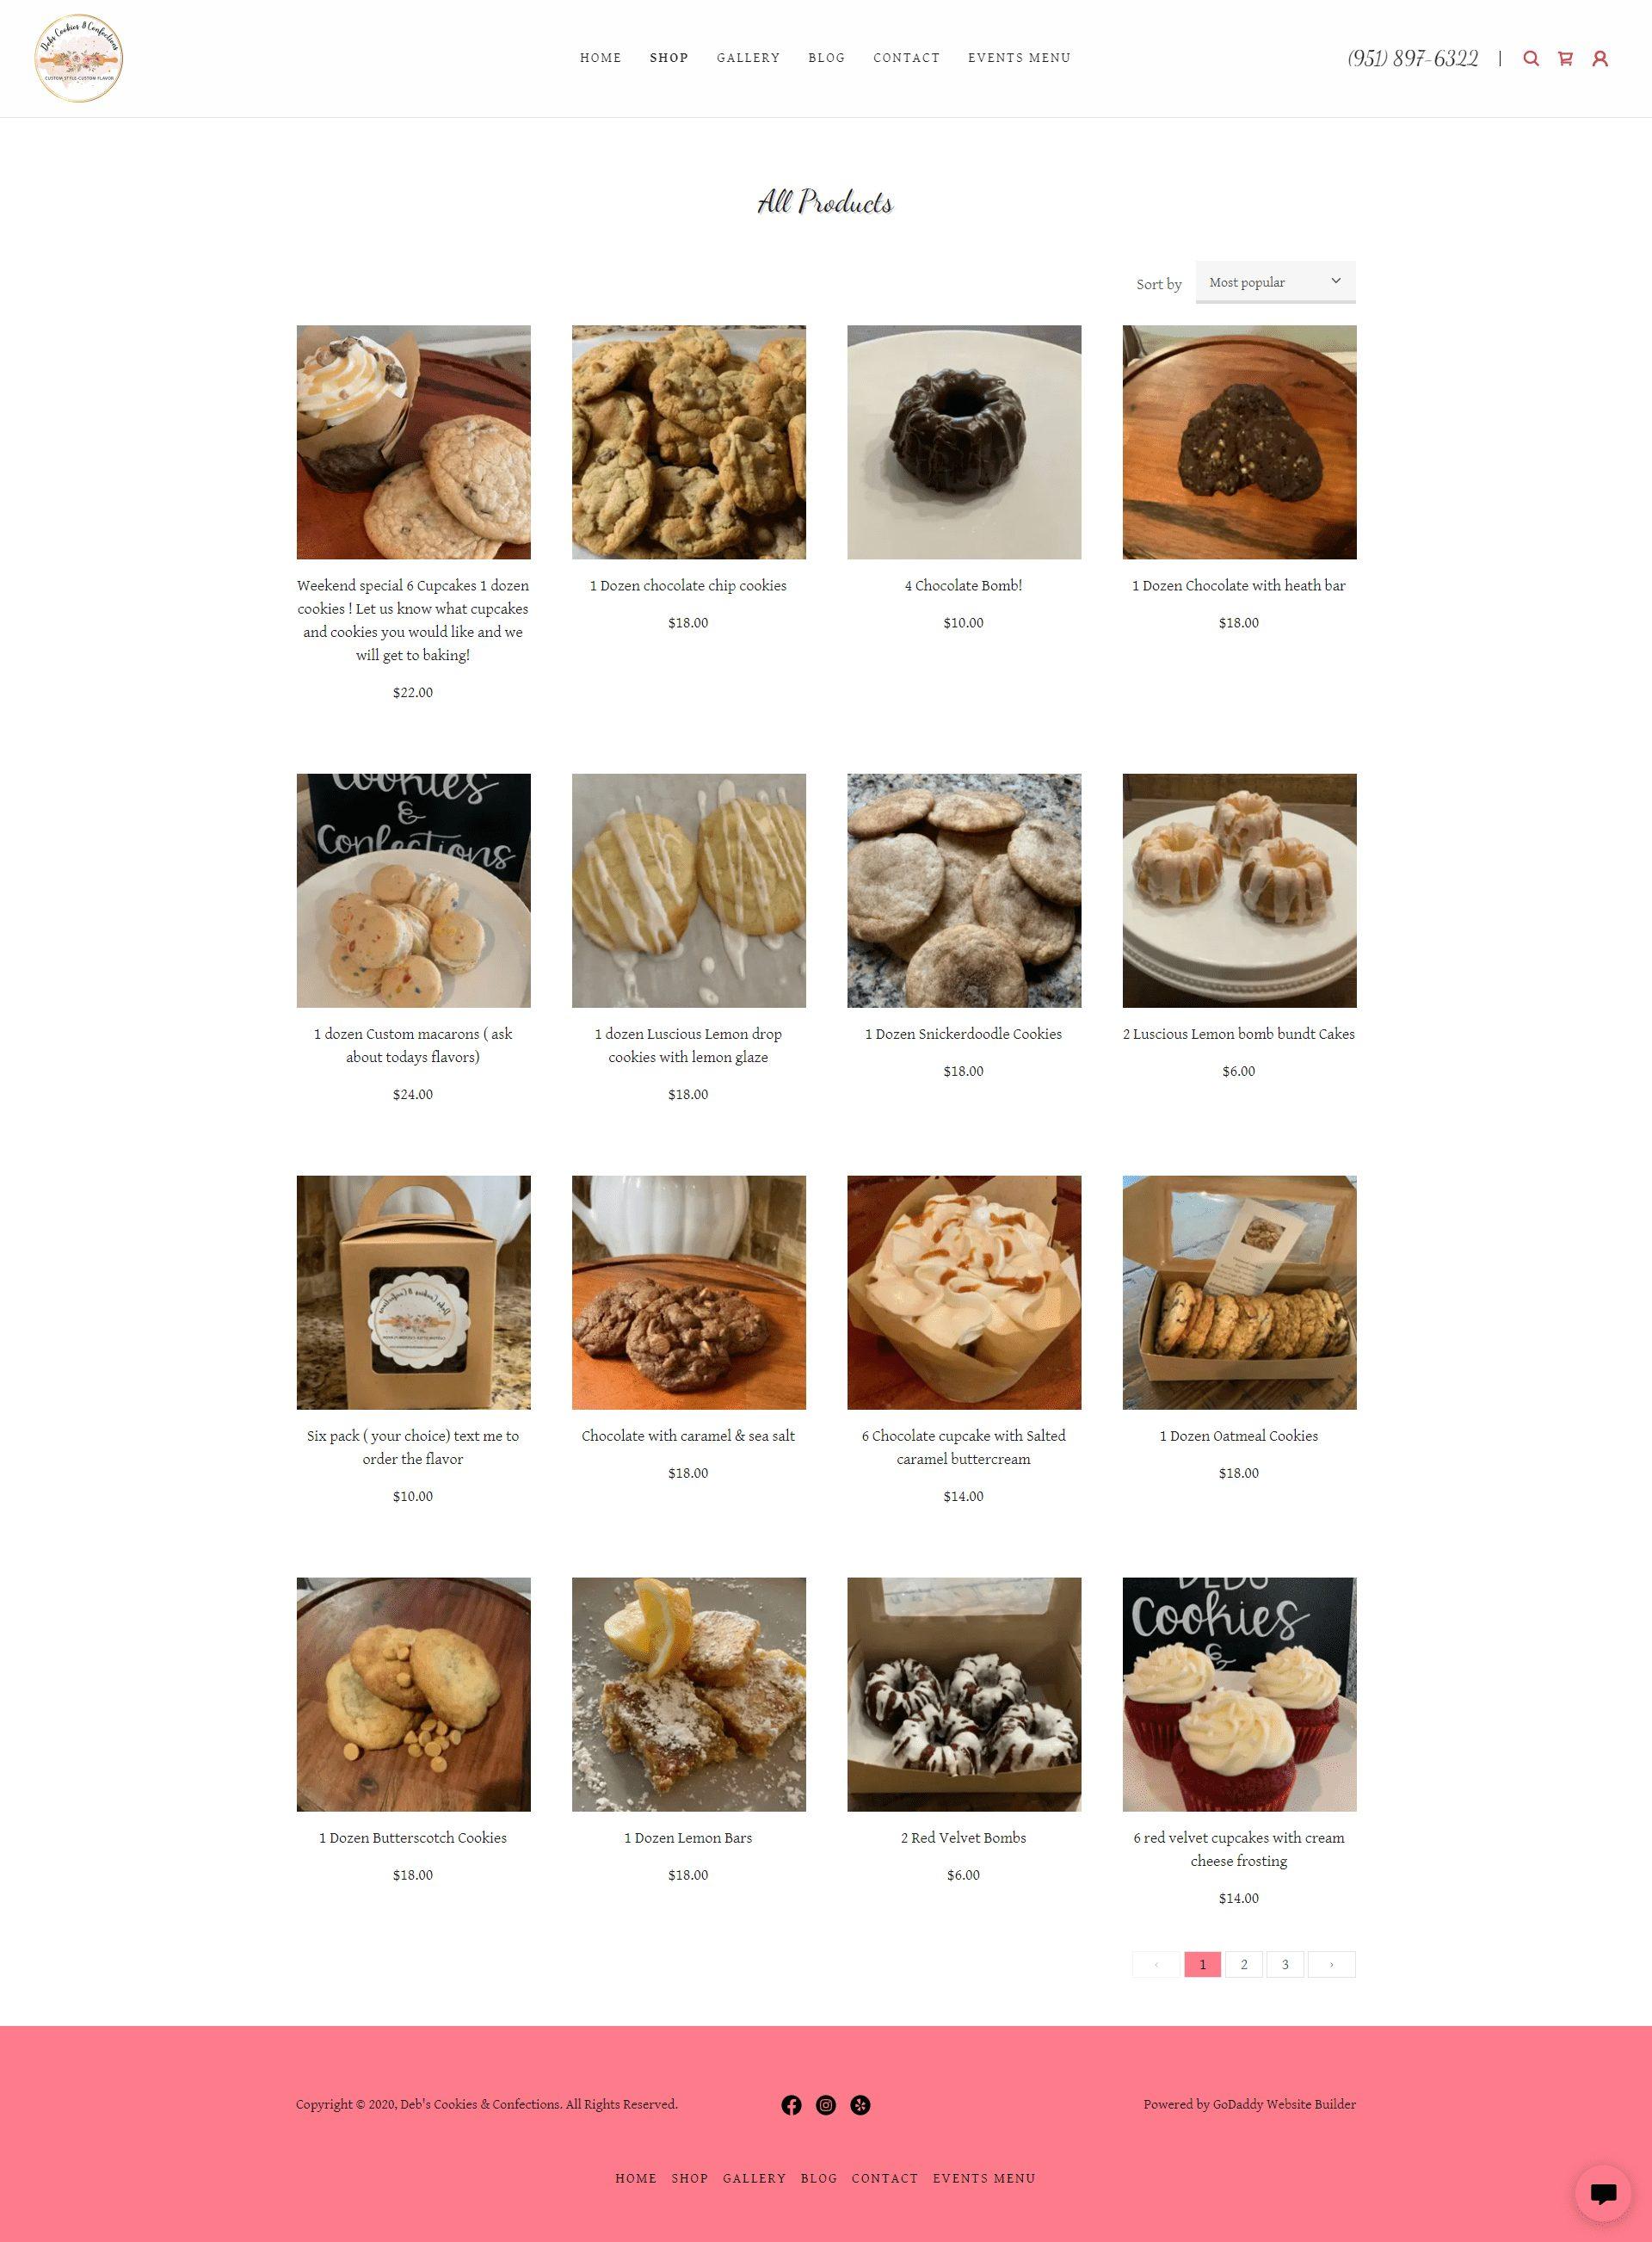 Deb's Cookies & Confections Shop Page